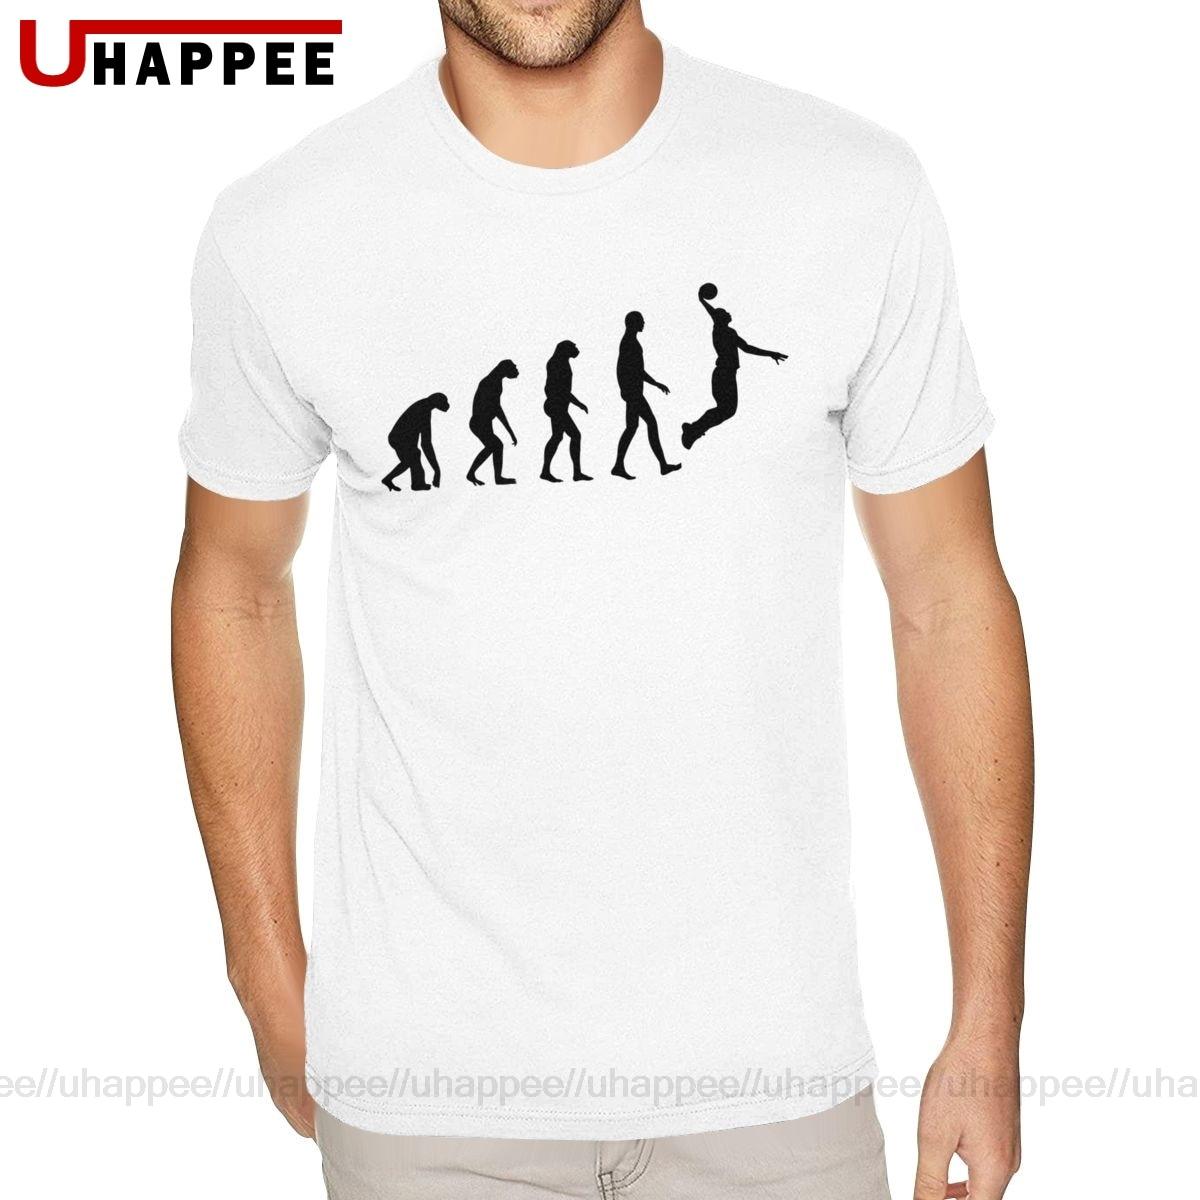 Pride Love Evolution Basketball Tshirt for Men 6XL Short Sleeves Heavy Cotton Round Neck Tees Shirt